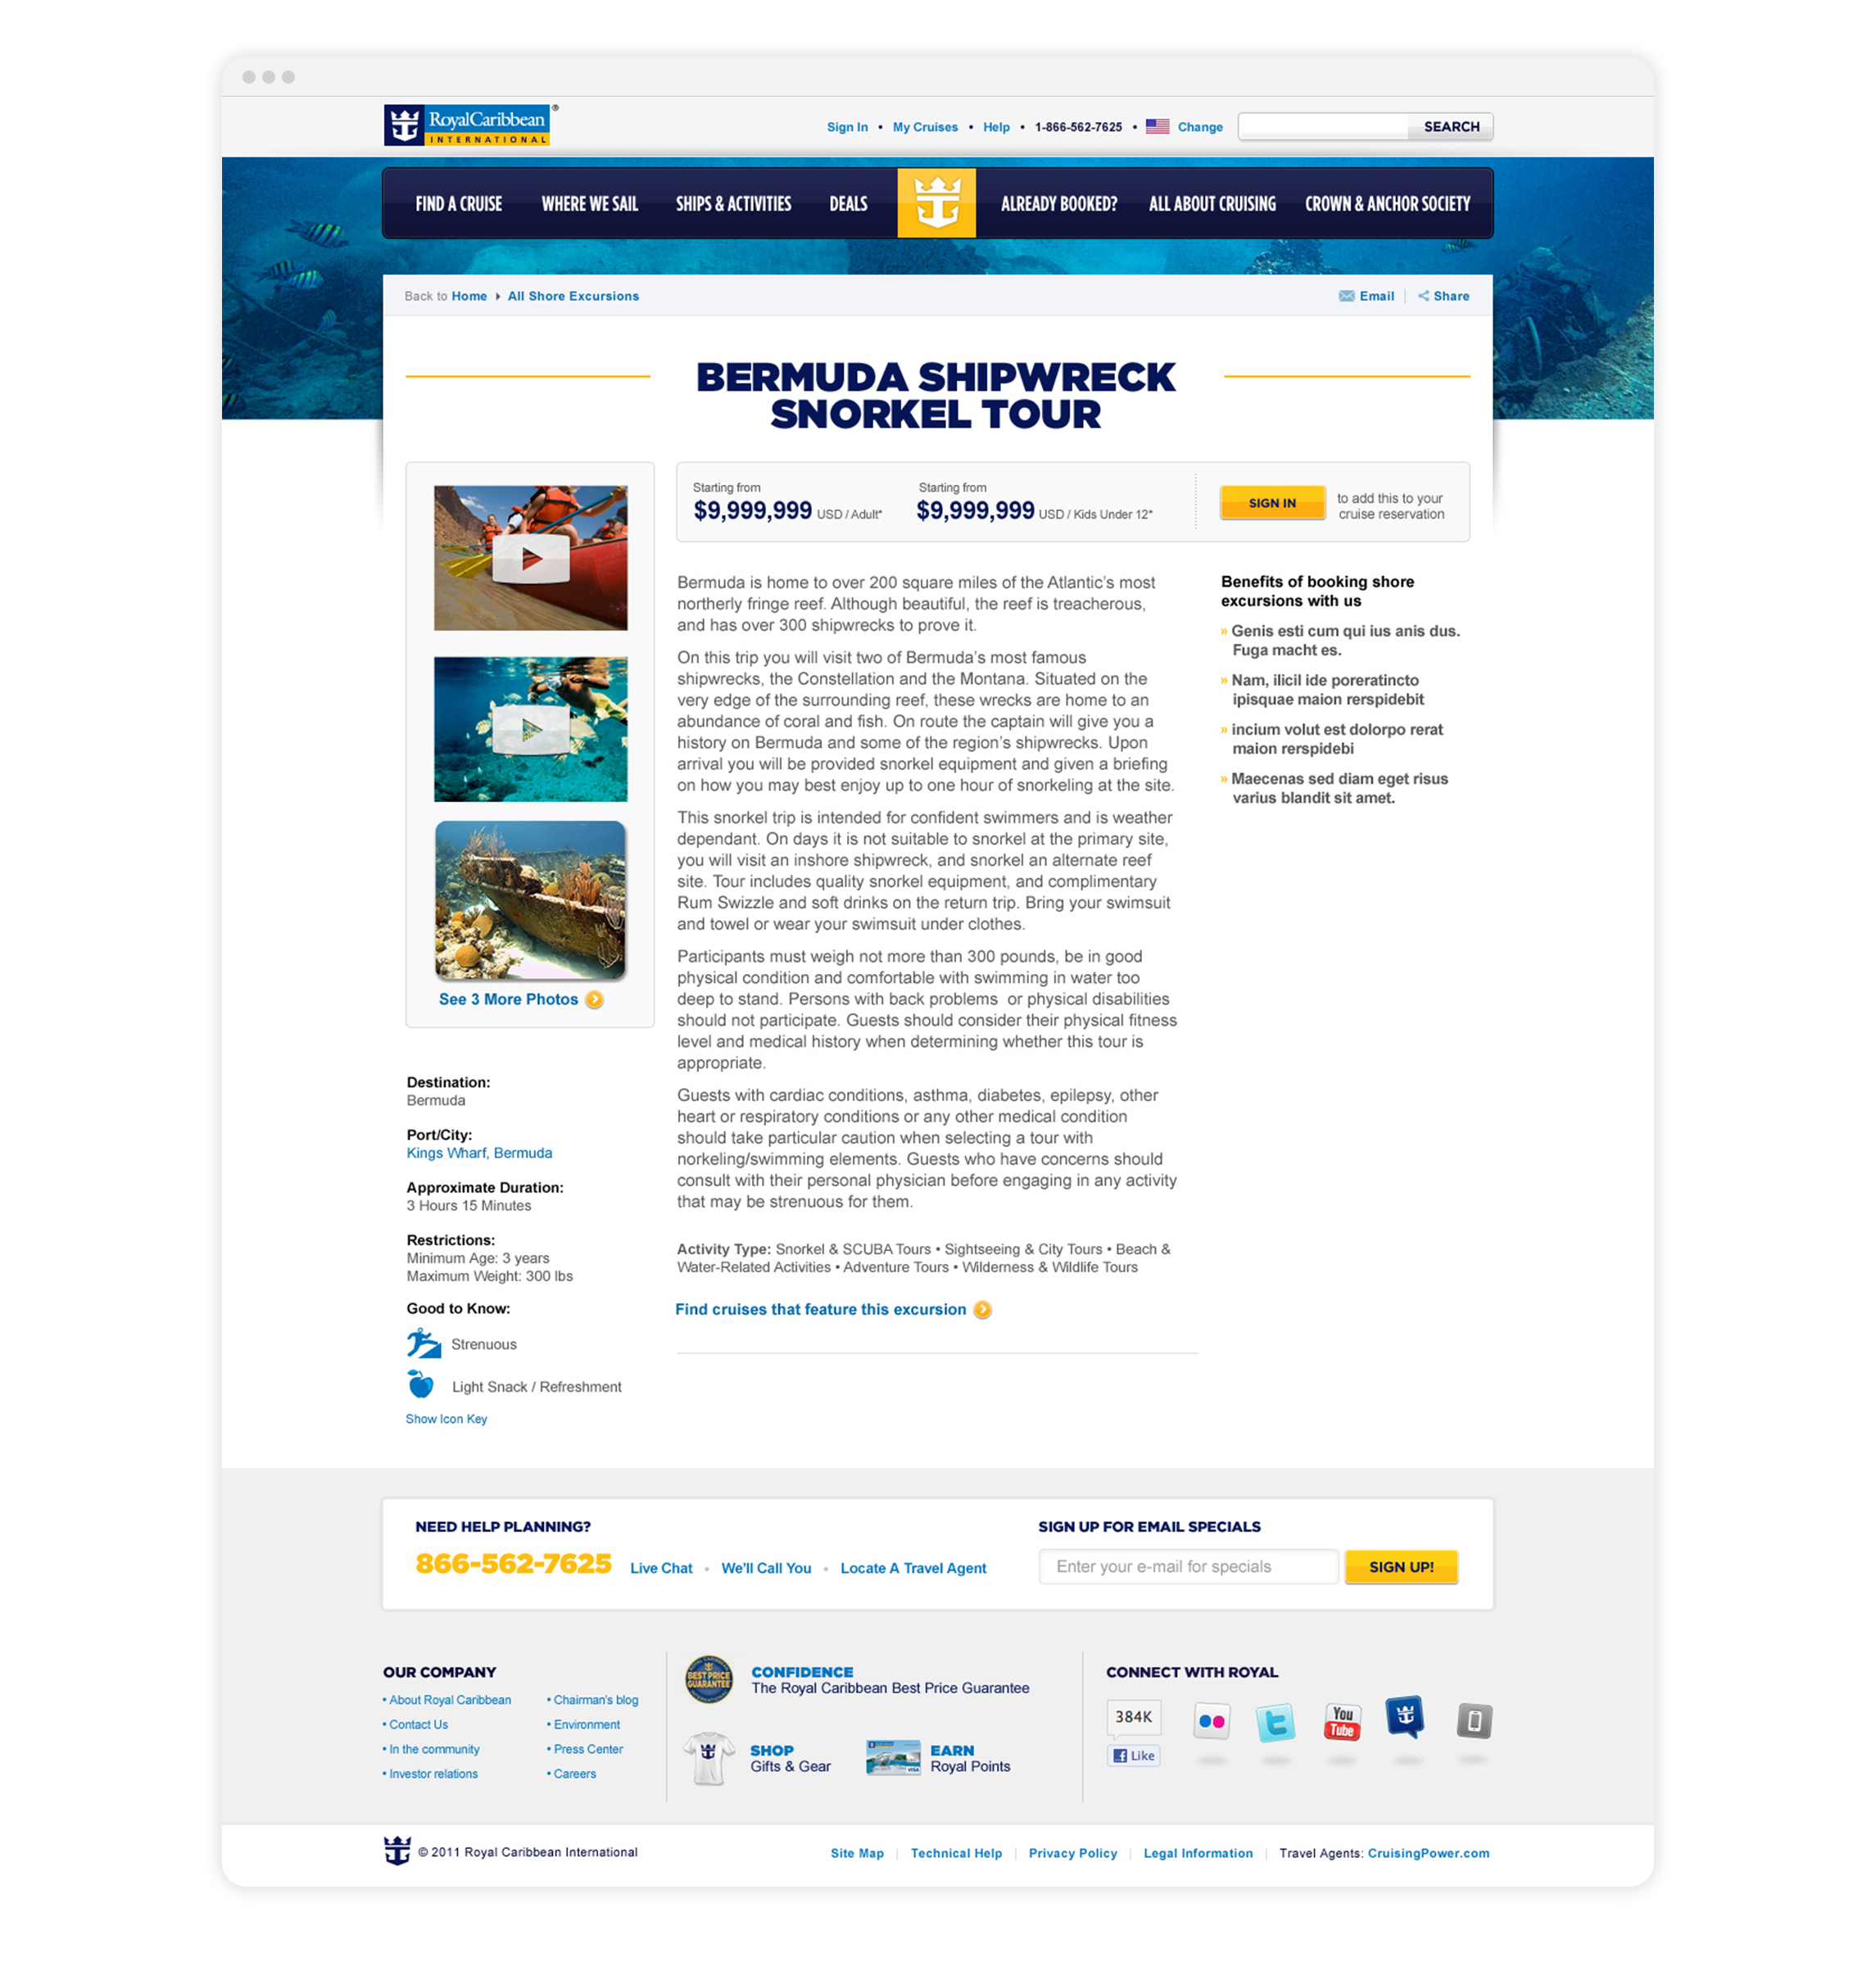 03royal-caribbean-international-tours.jpg